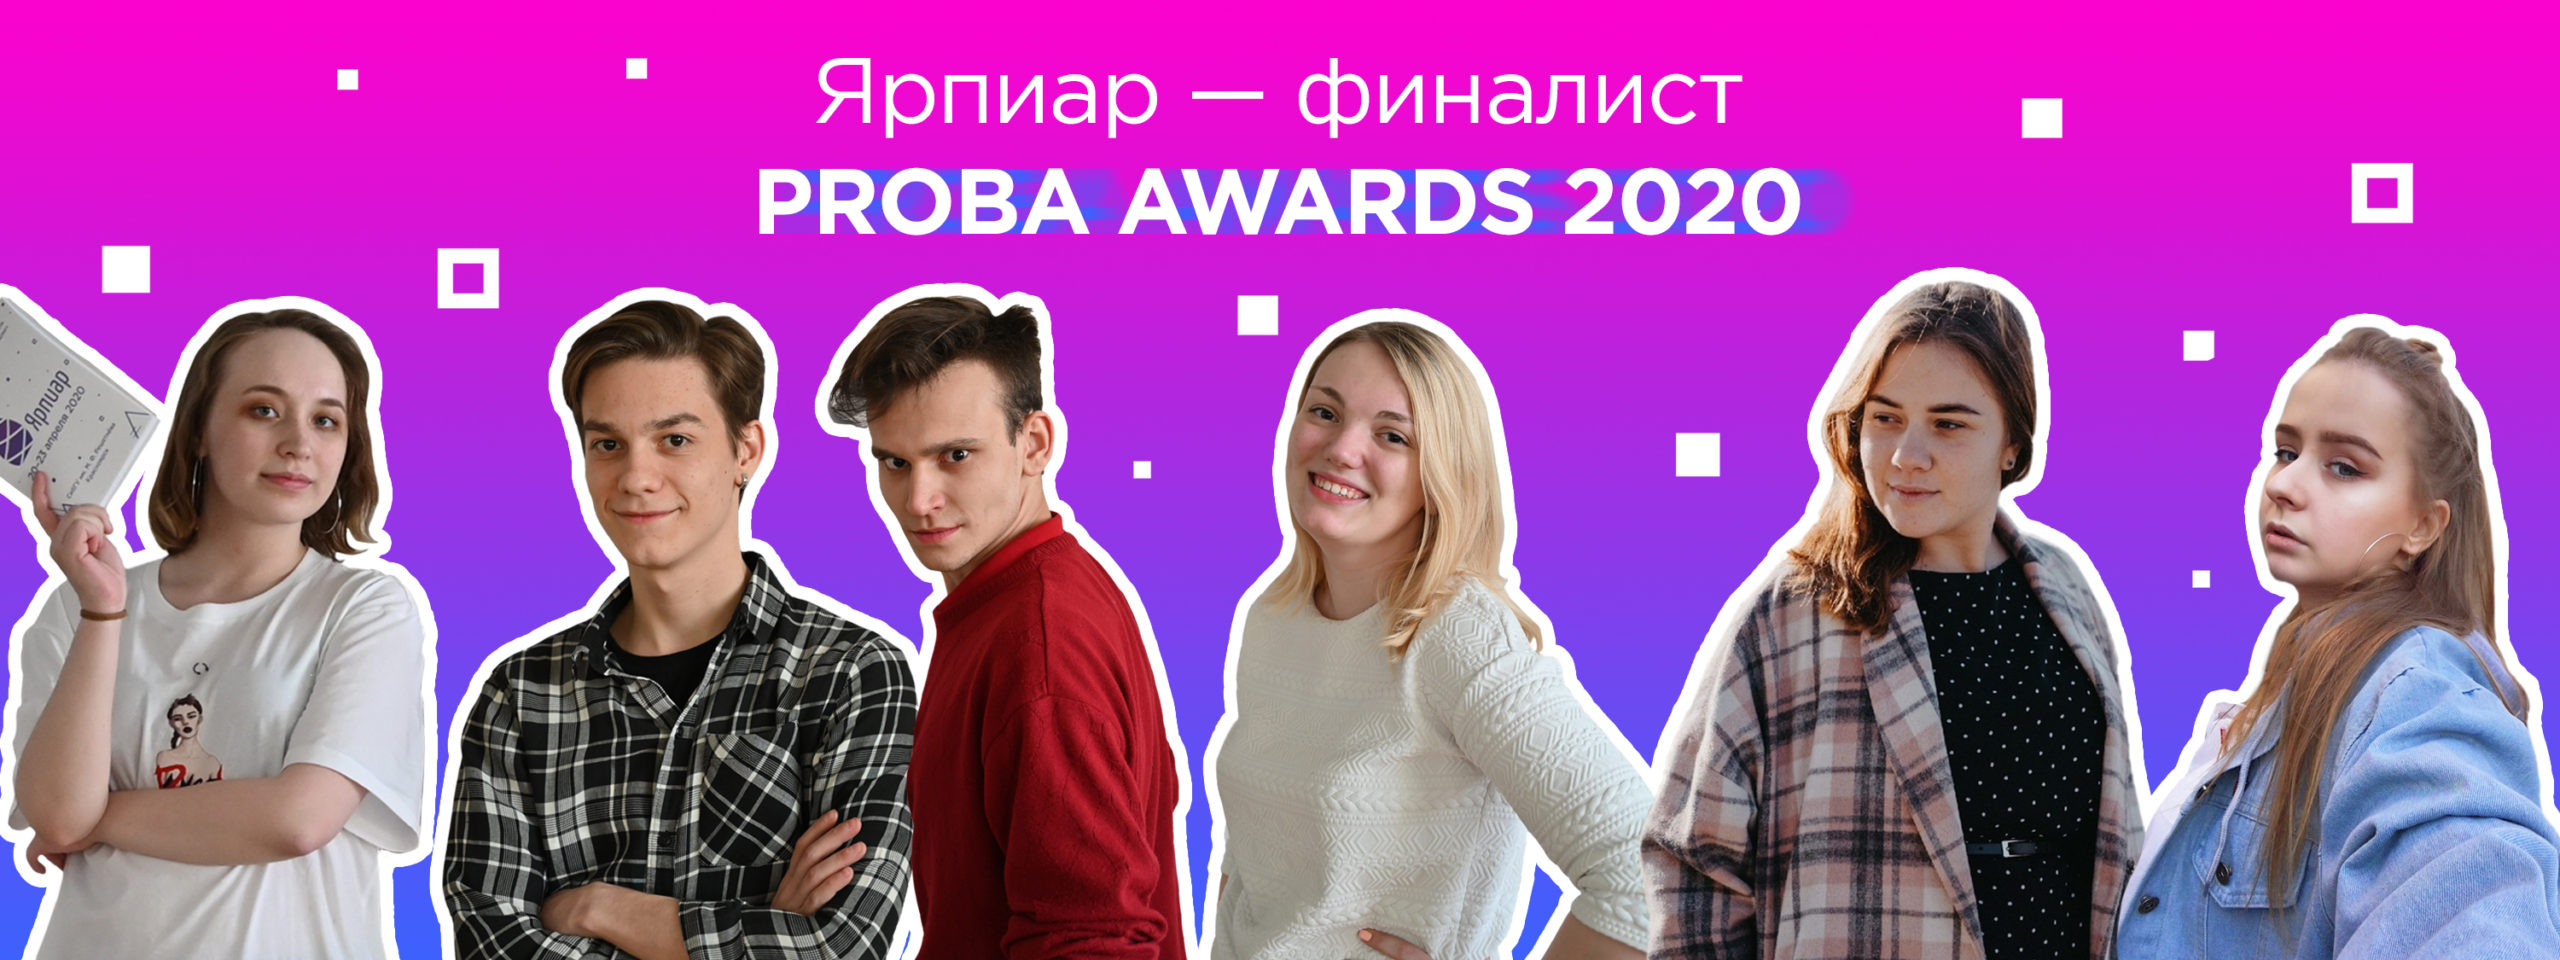 yarpyar_vk_kopia (1)